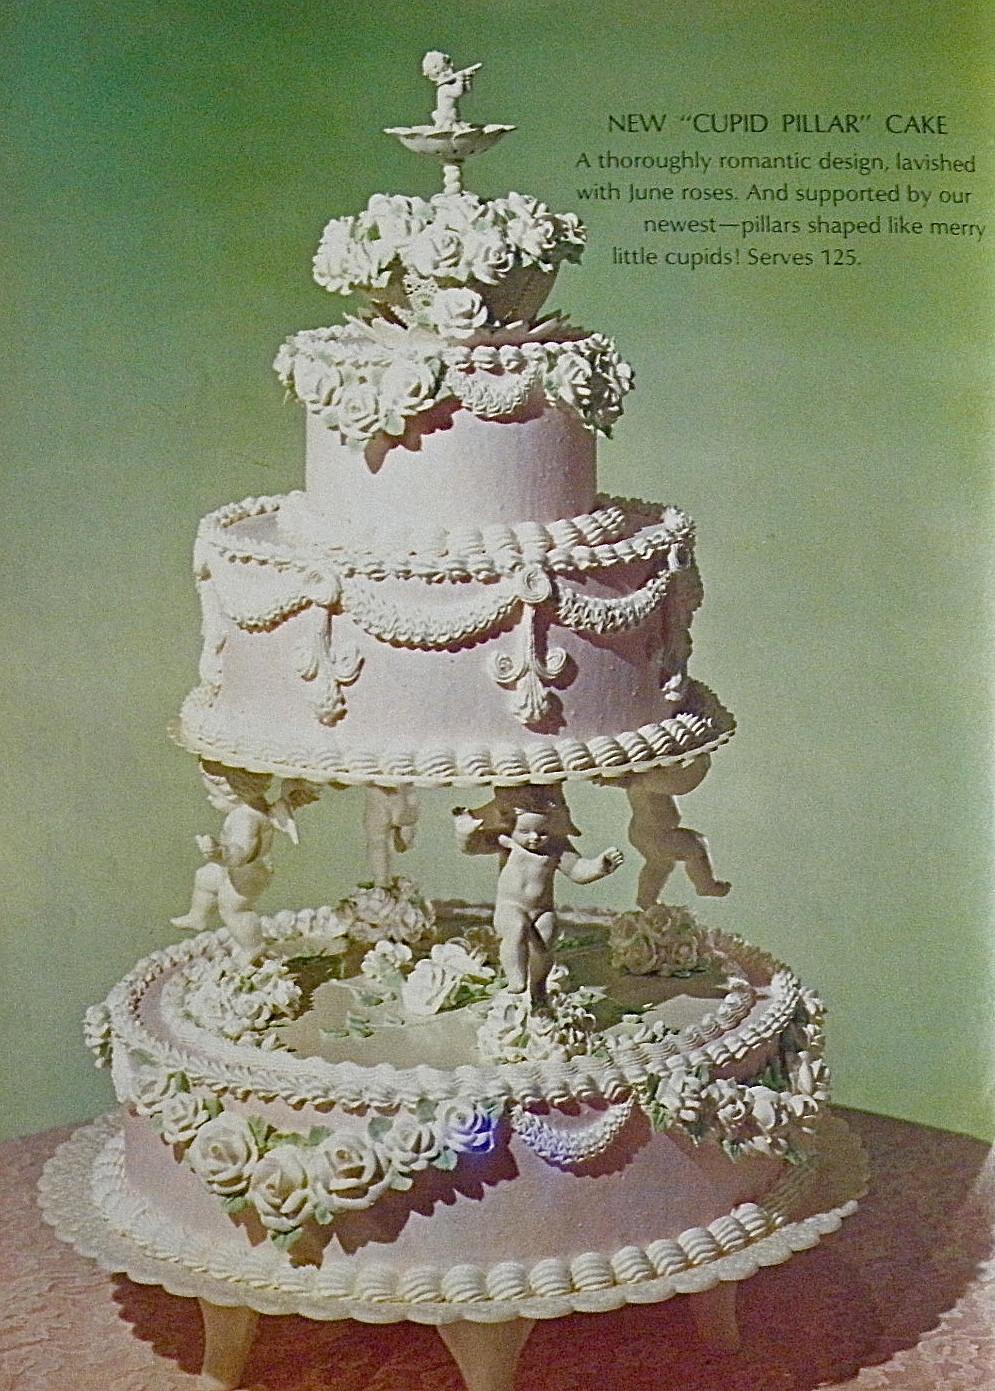 Wedding Cakes With Pillars  Good Things by David Vintage Wilton Wedding Cakes